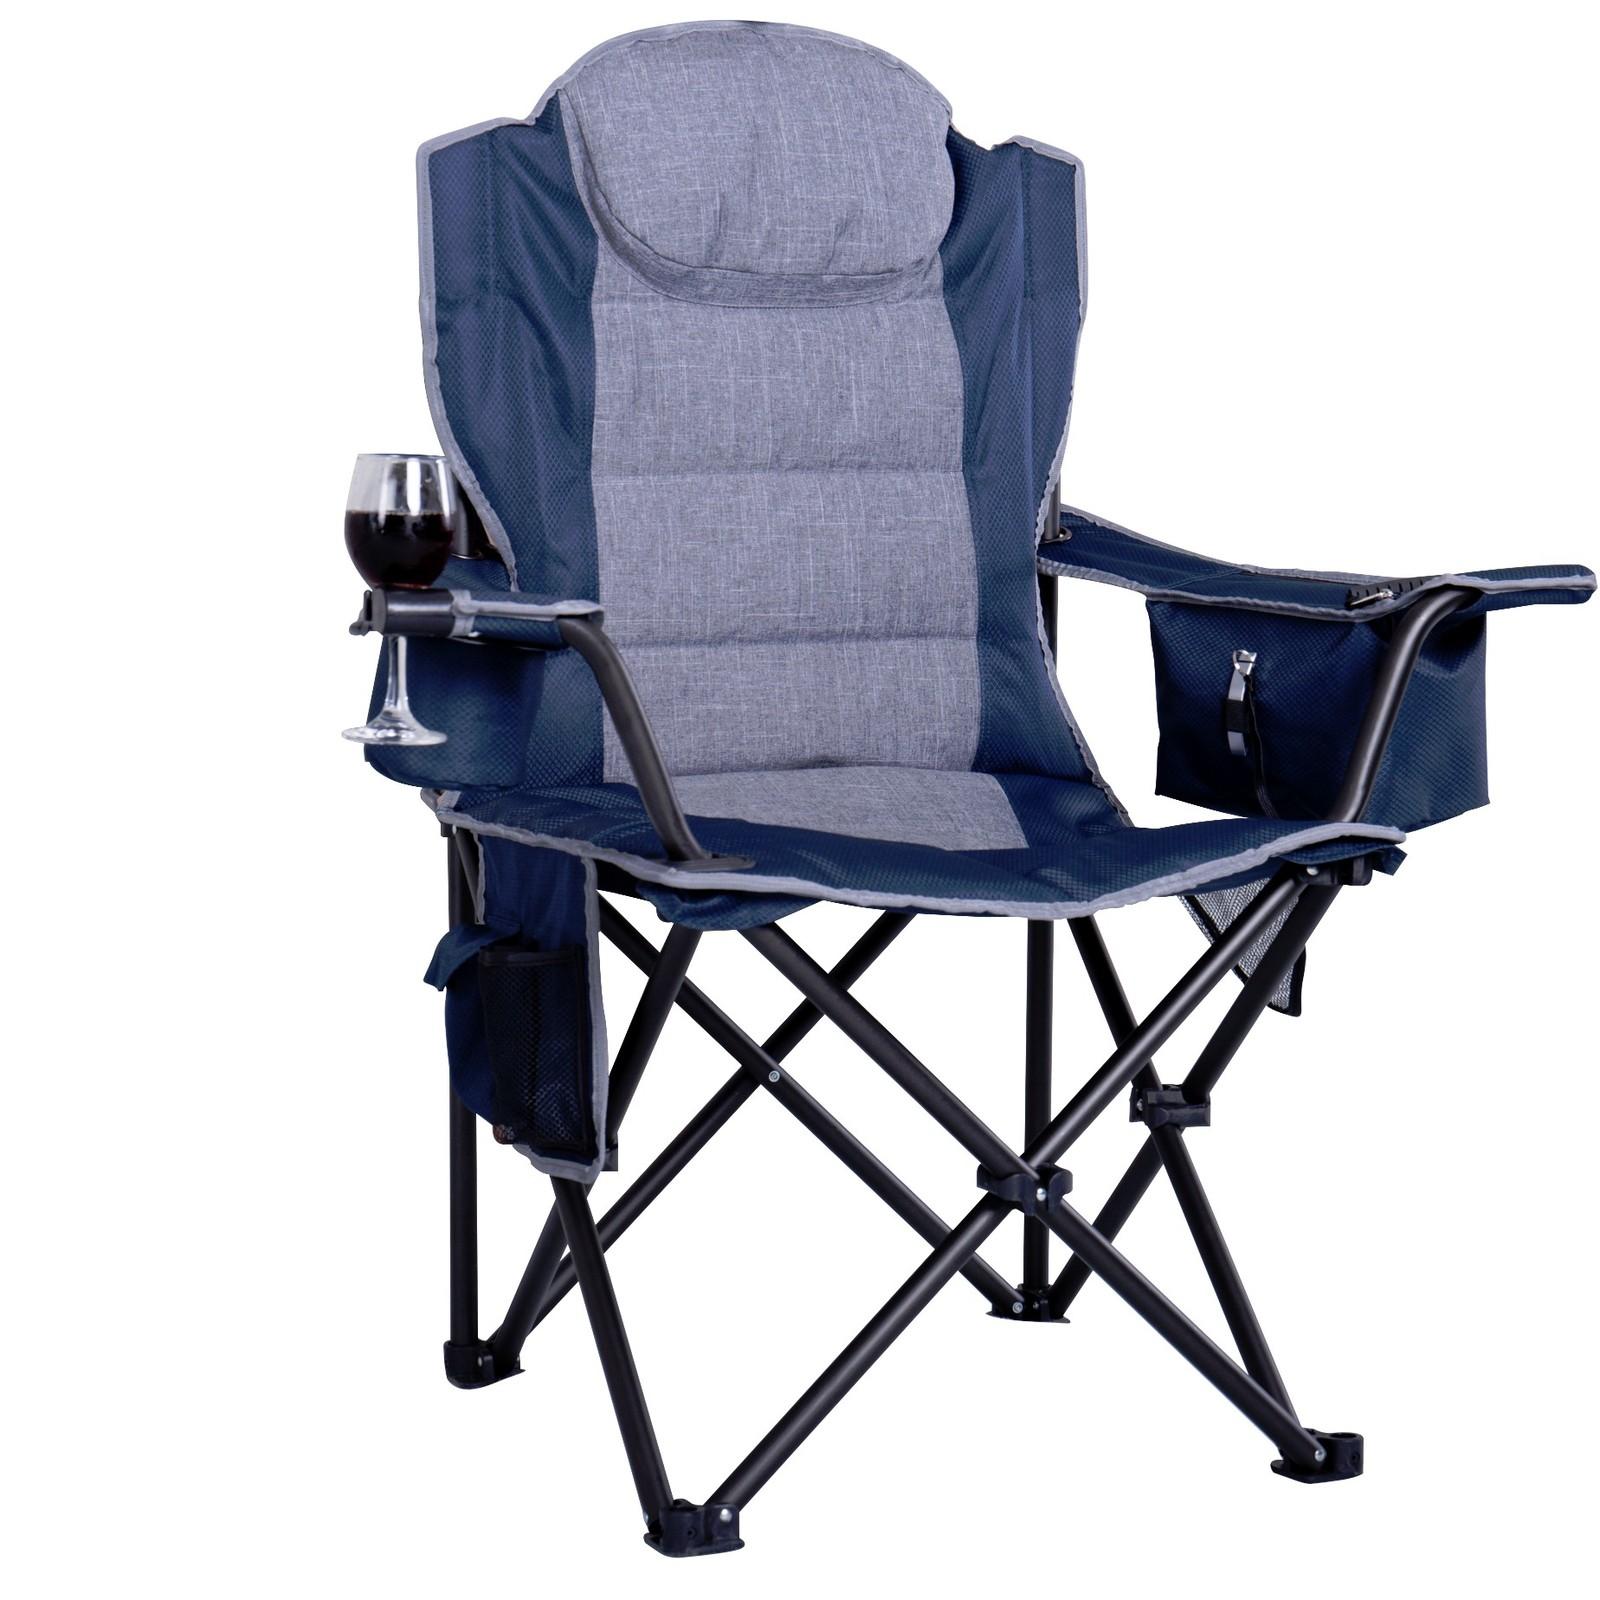 Oztrail Big Boy Folding Camp Chair Camping Furniture